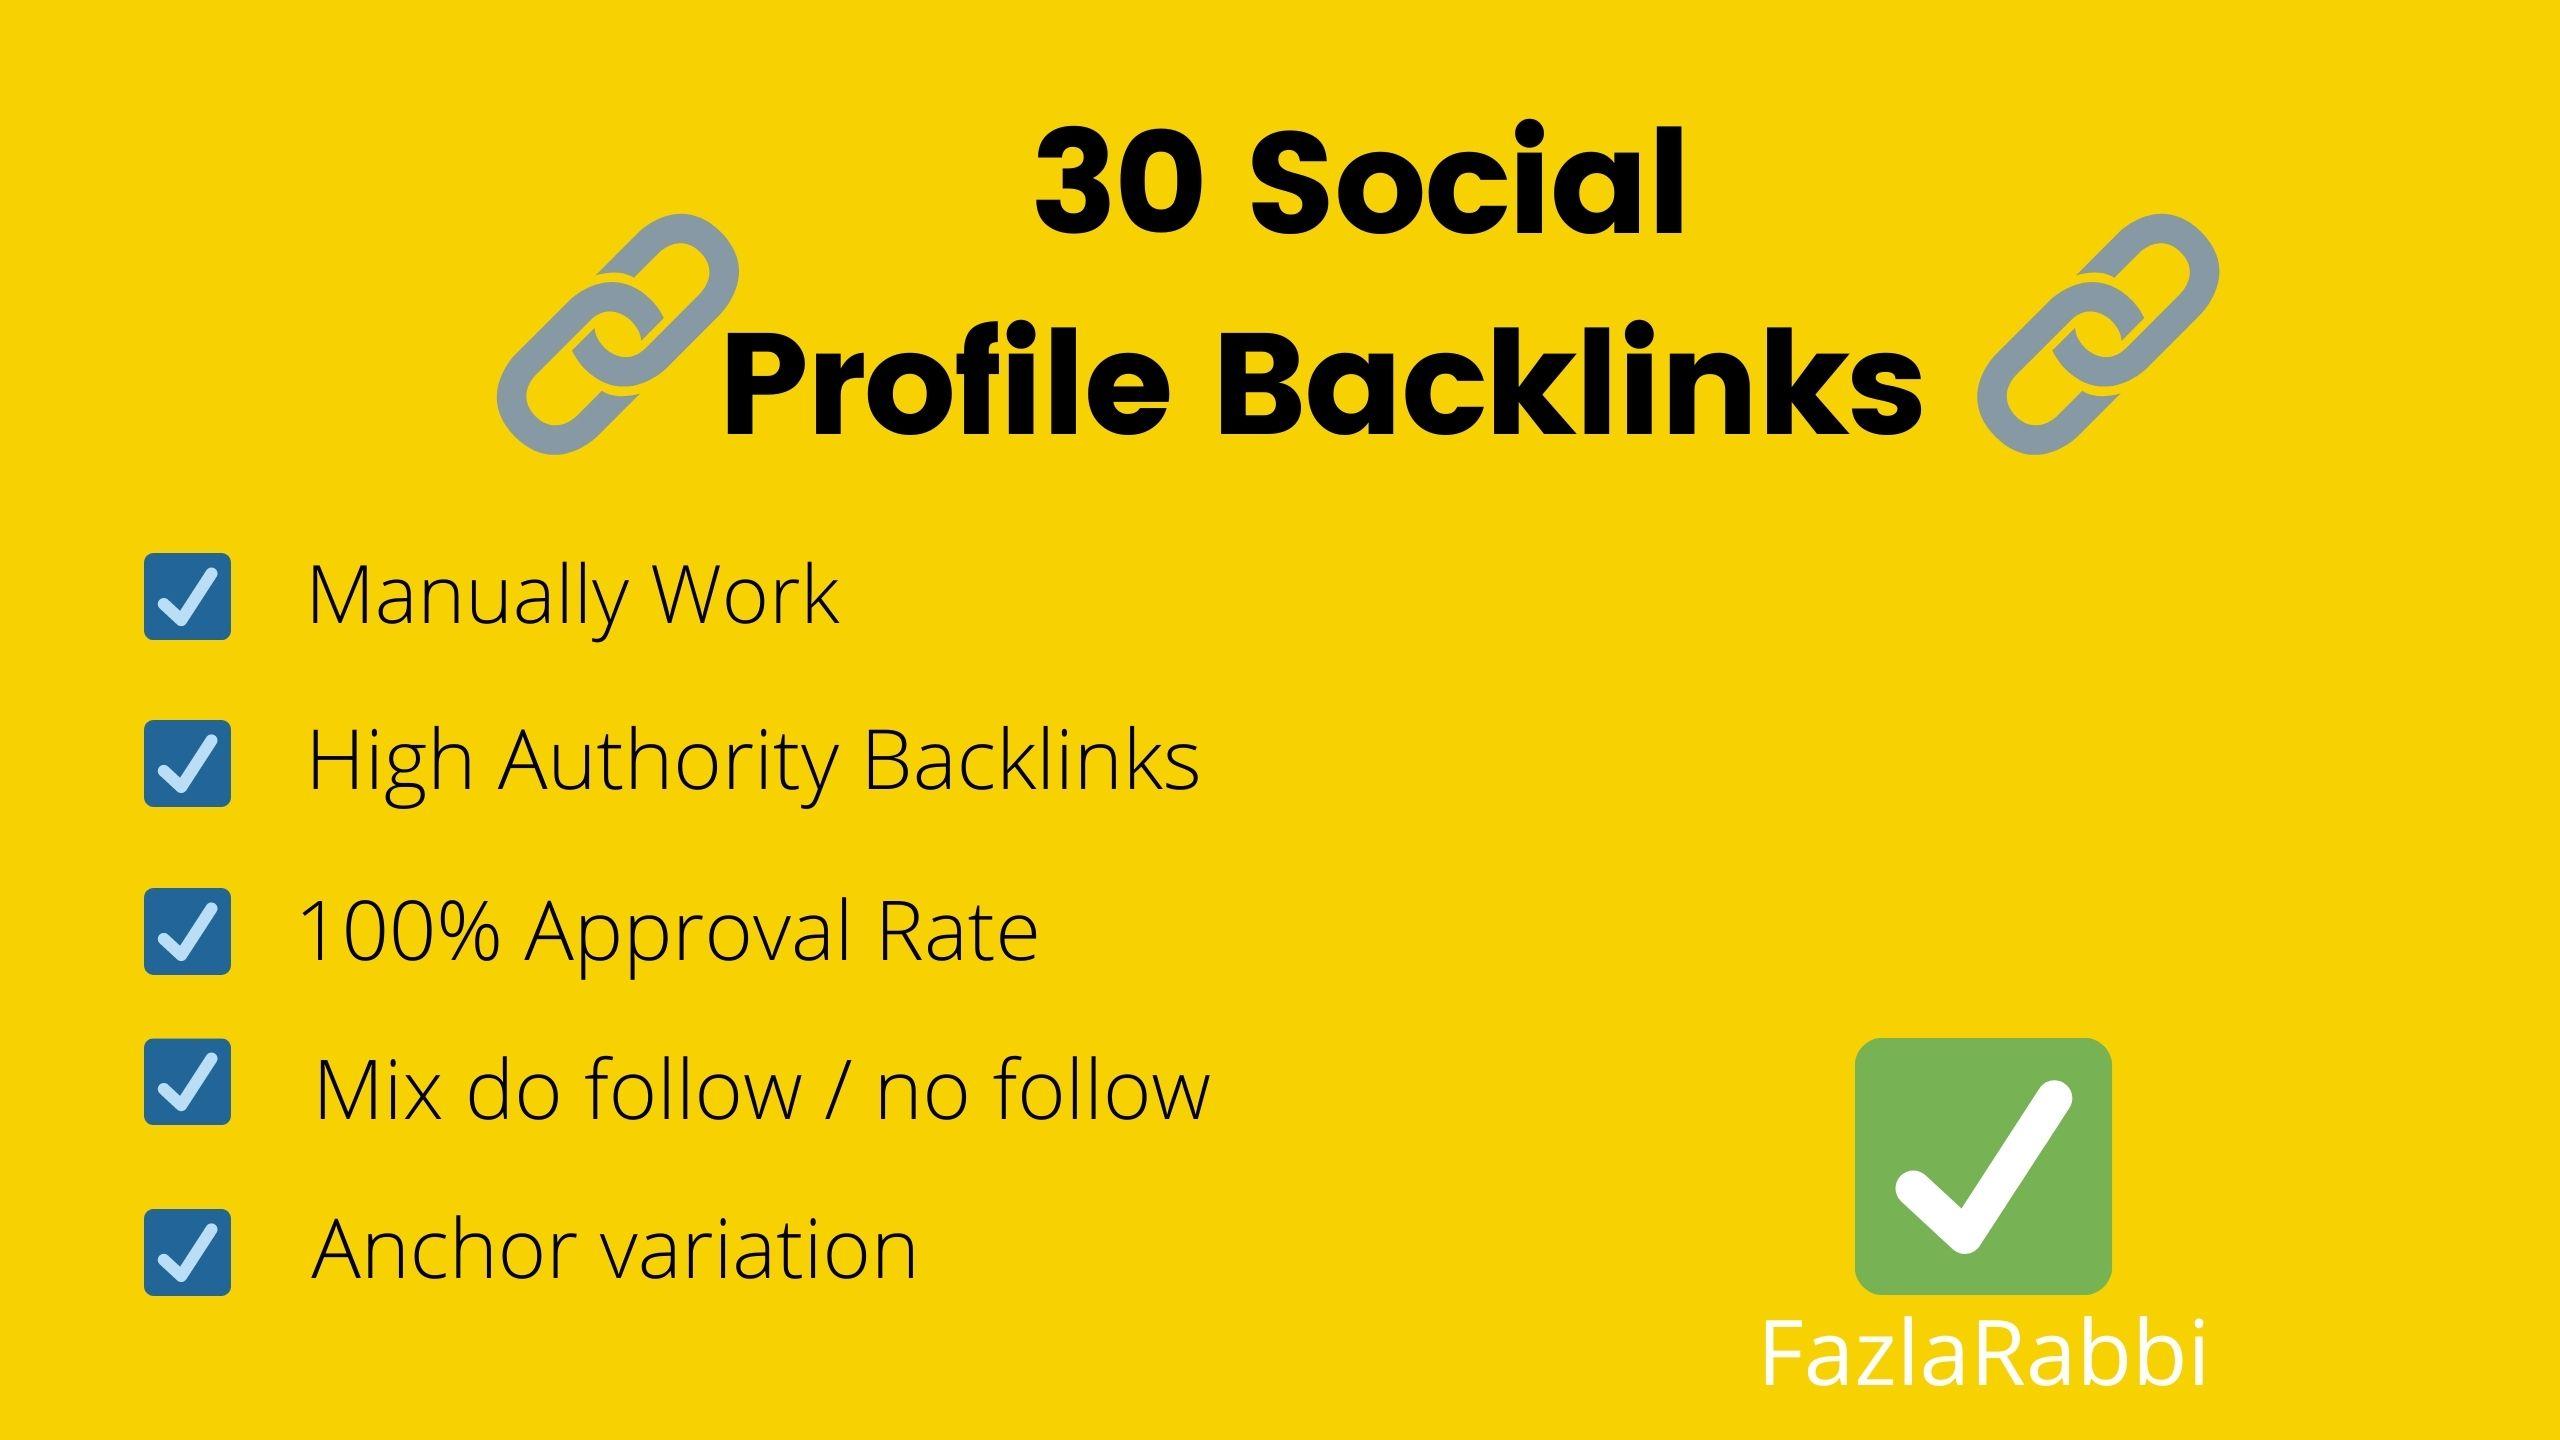 Manually created 30 Social Profile On High Authority backlinks